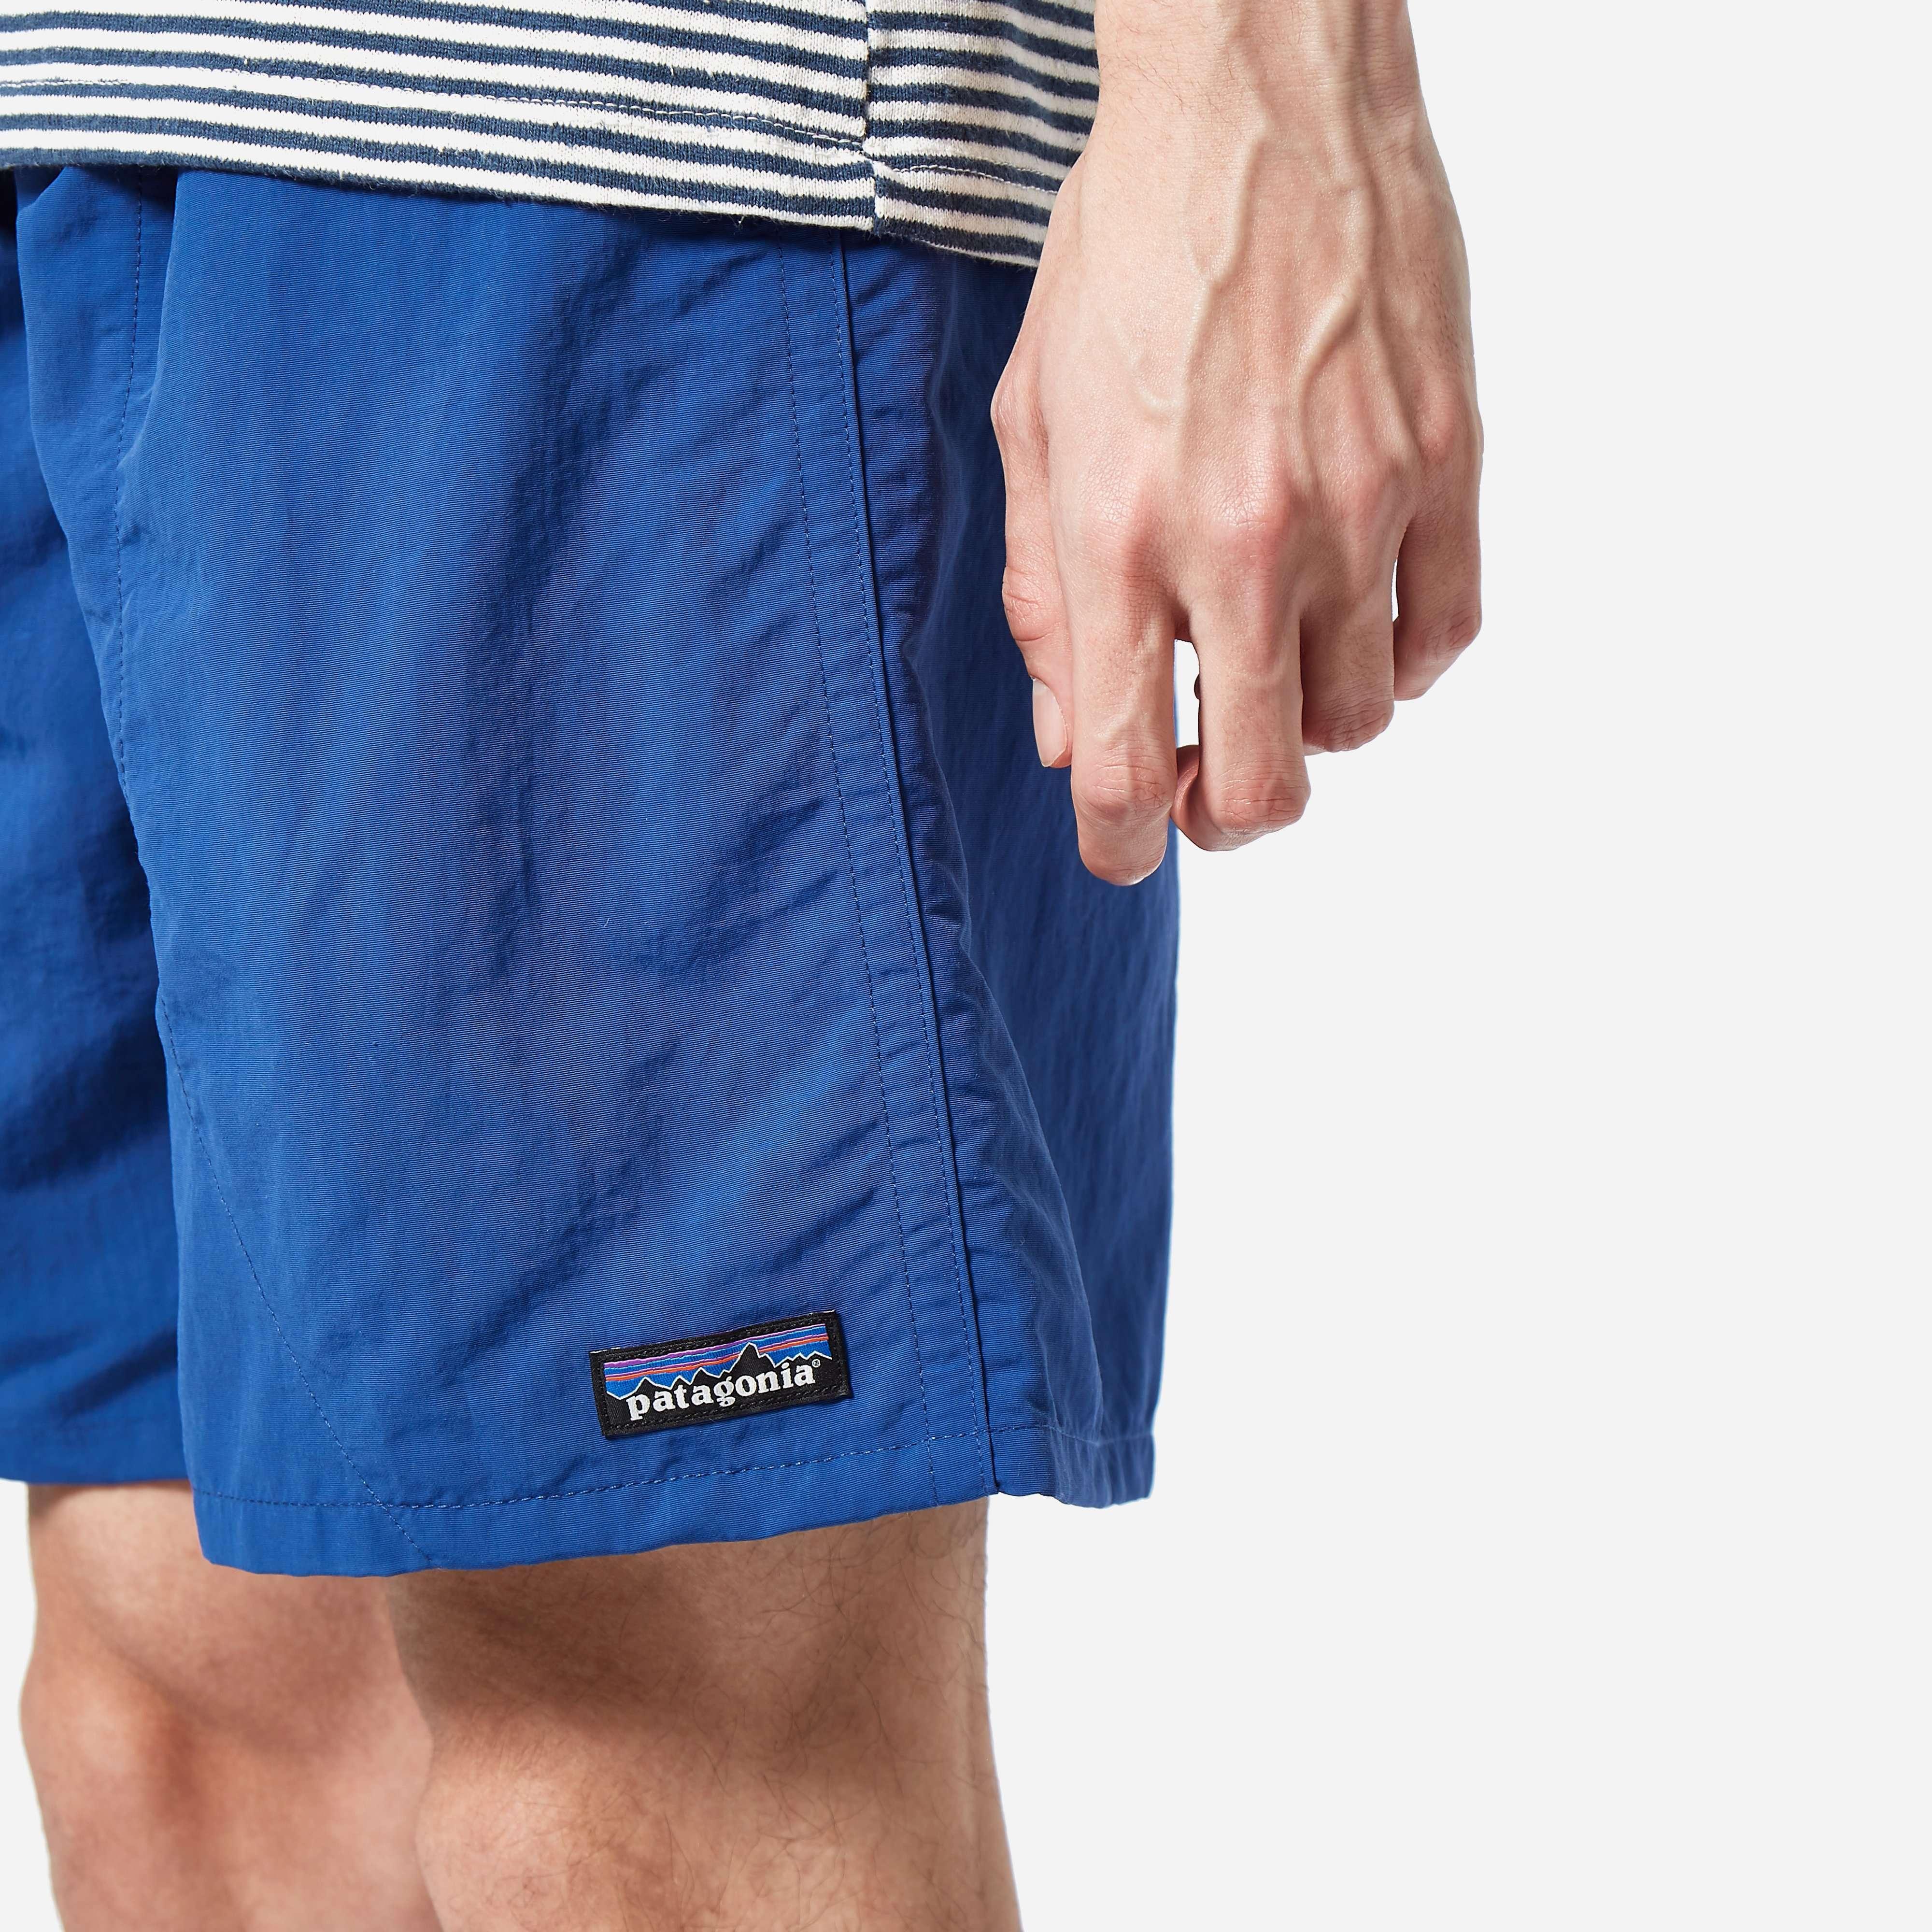 Patagonia Baggies Long Shorts